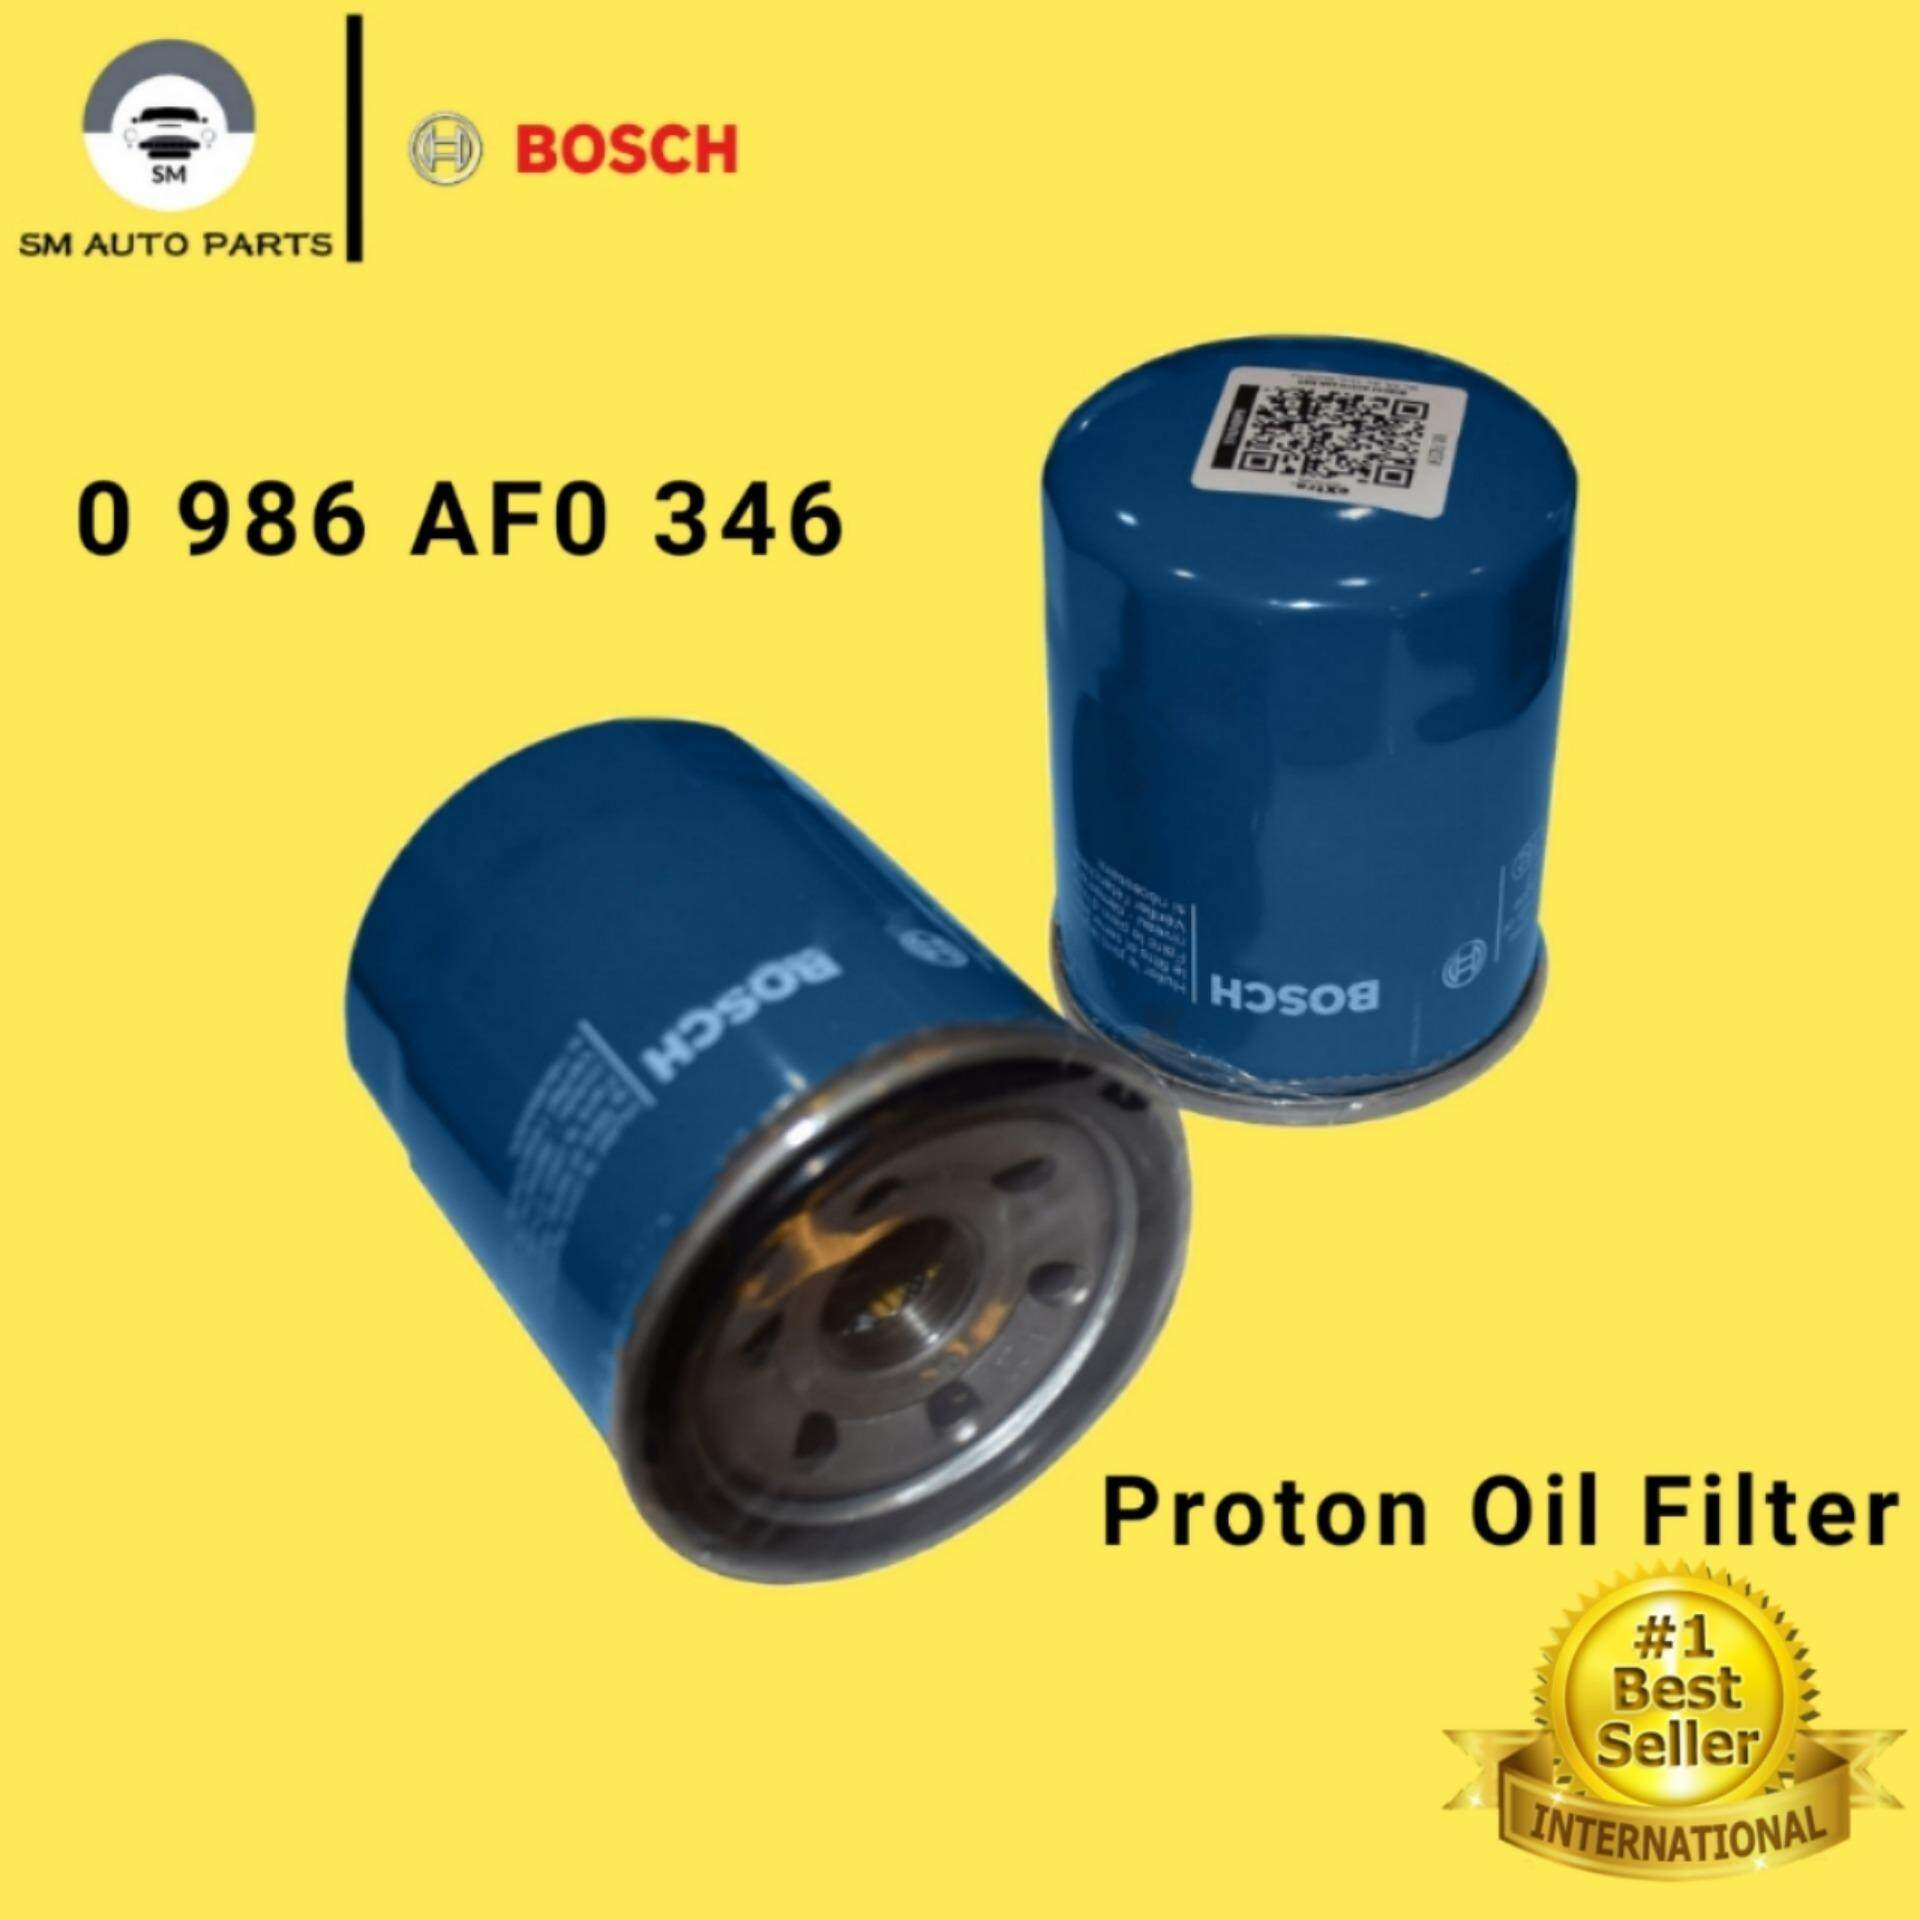 Bosch Power Tools With Best Price At Lazada Malaysia 8 Pcs 3 10mm Cyl 4 Mata Bor Multi Purpose Set Oil Filter For Proton Wira Saga Gen2 Persona Exora